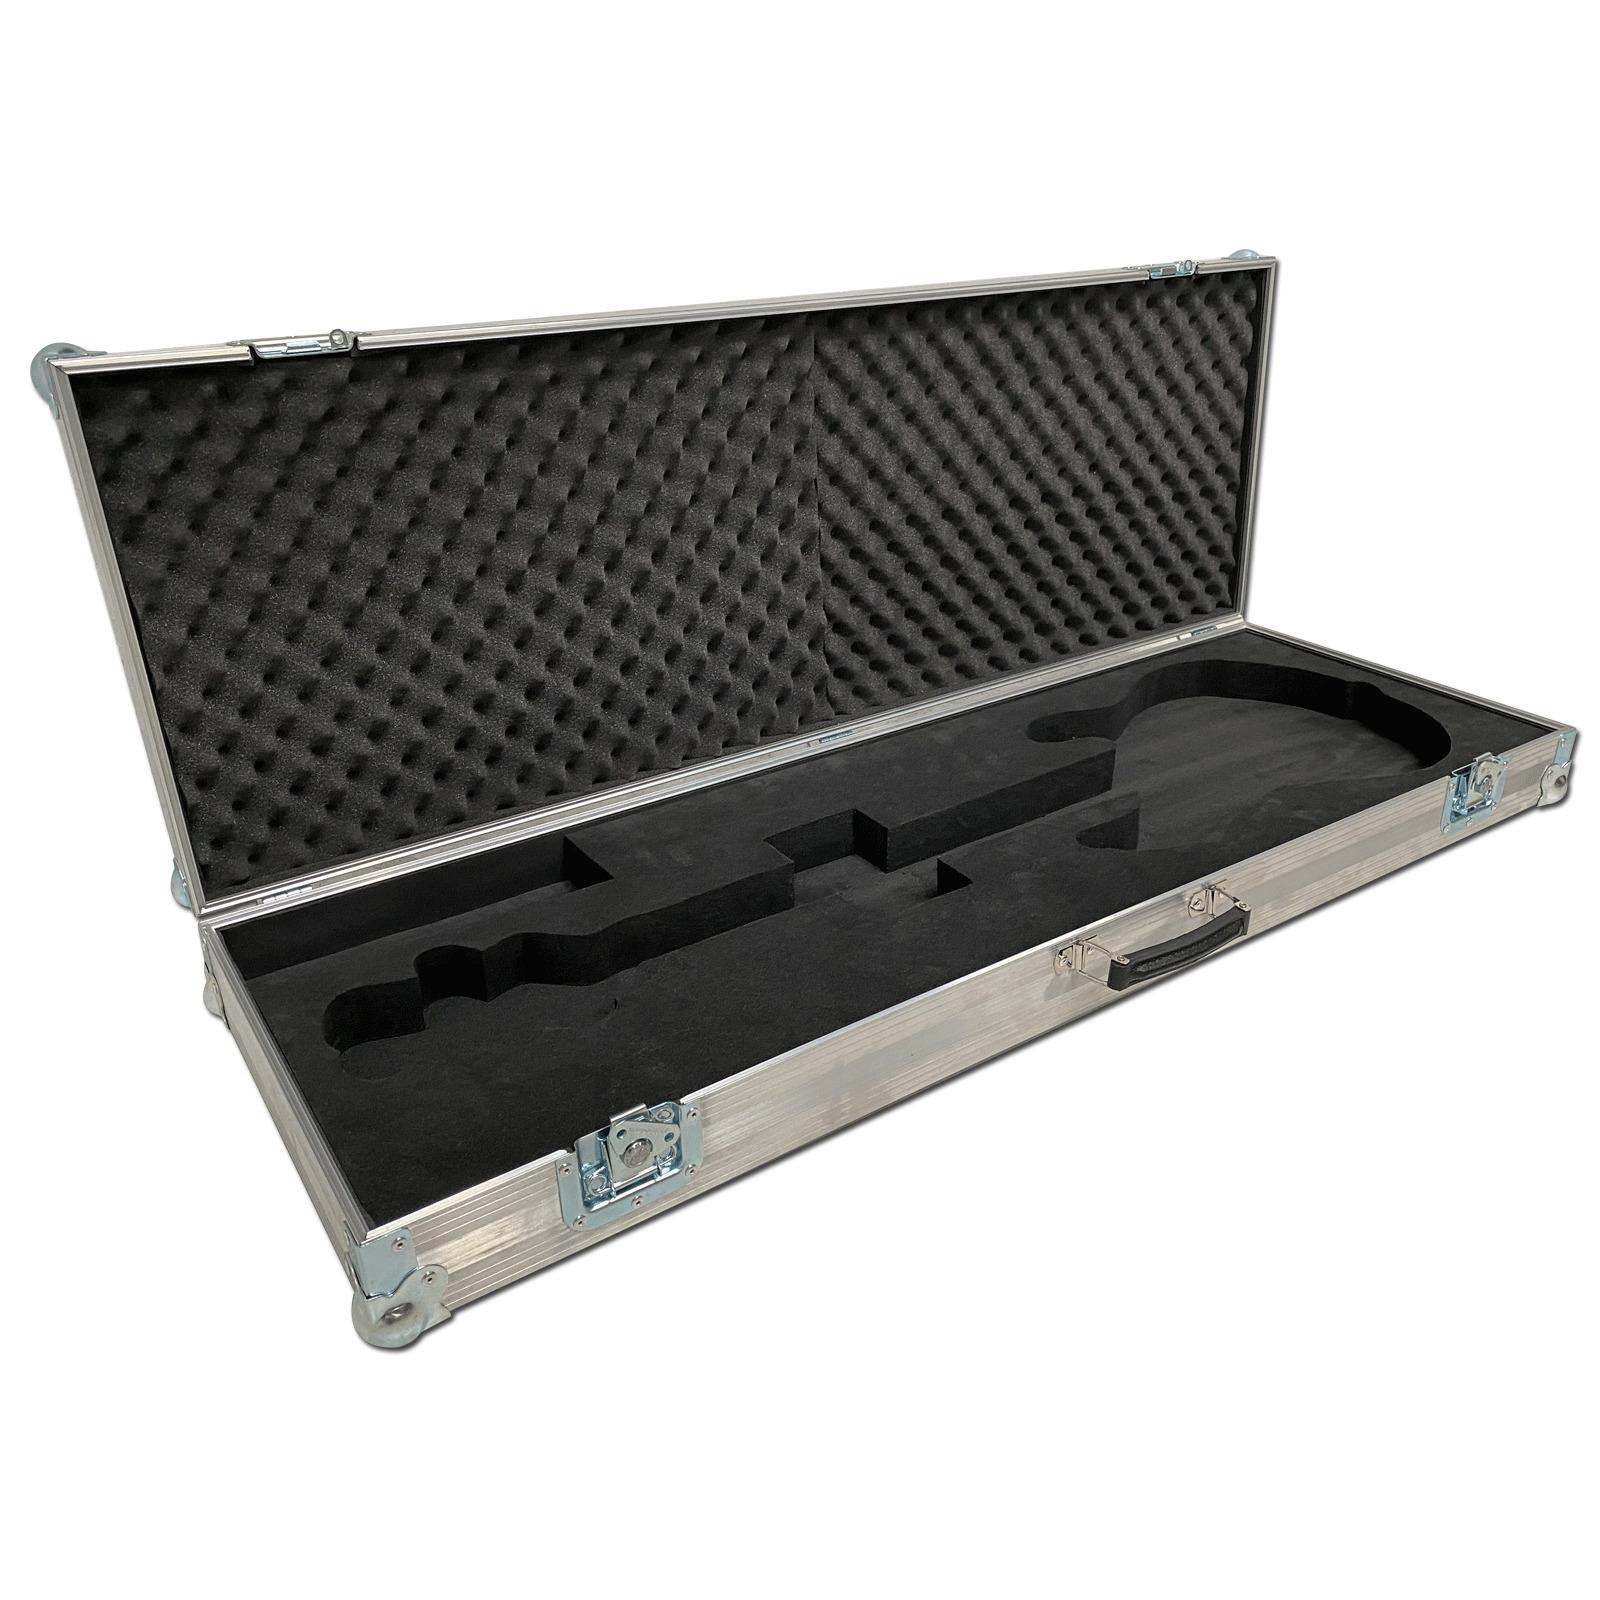 musicman stingray bass case. Black Bedroom Furniture Sets. Home Design Ideas